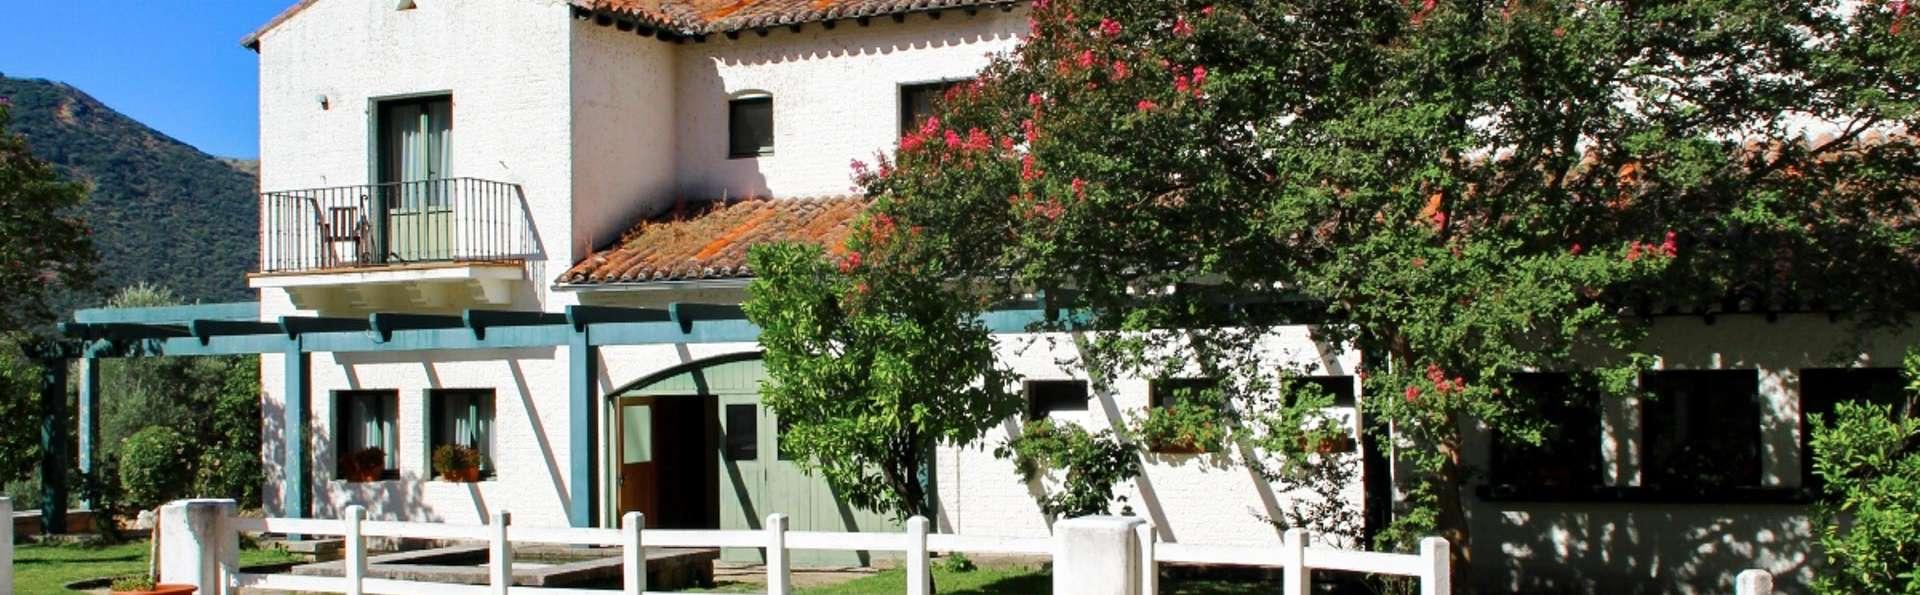 Casa Aldeaduero - EDIT_FRONT_01.jpg